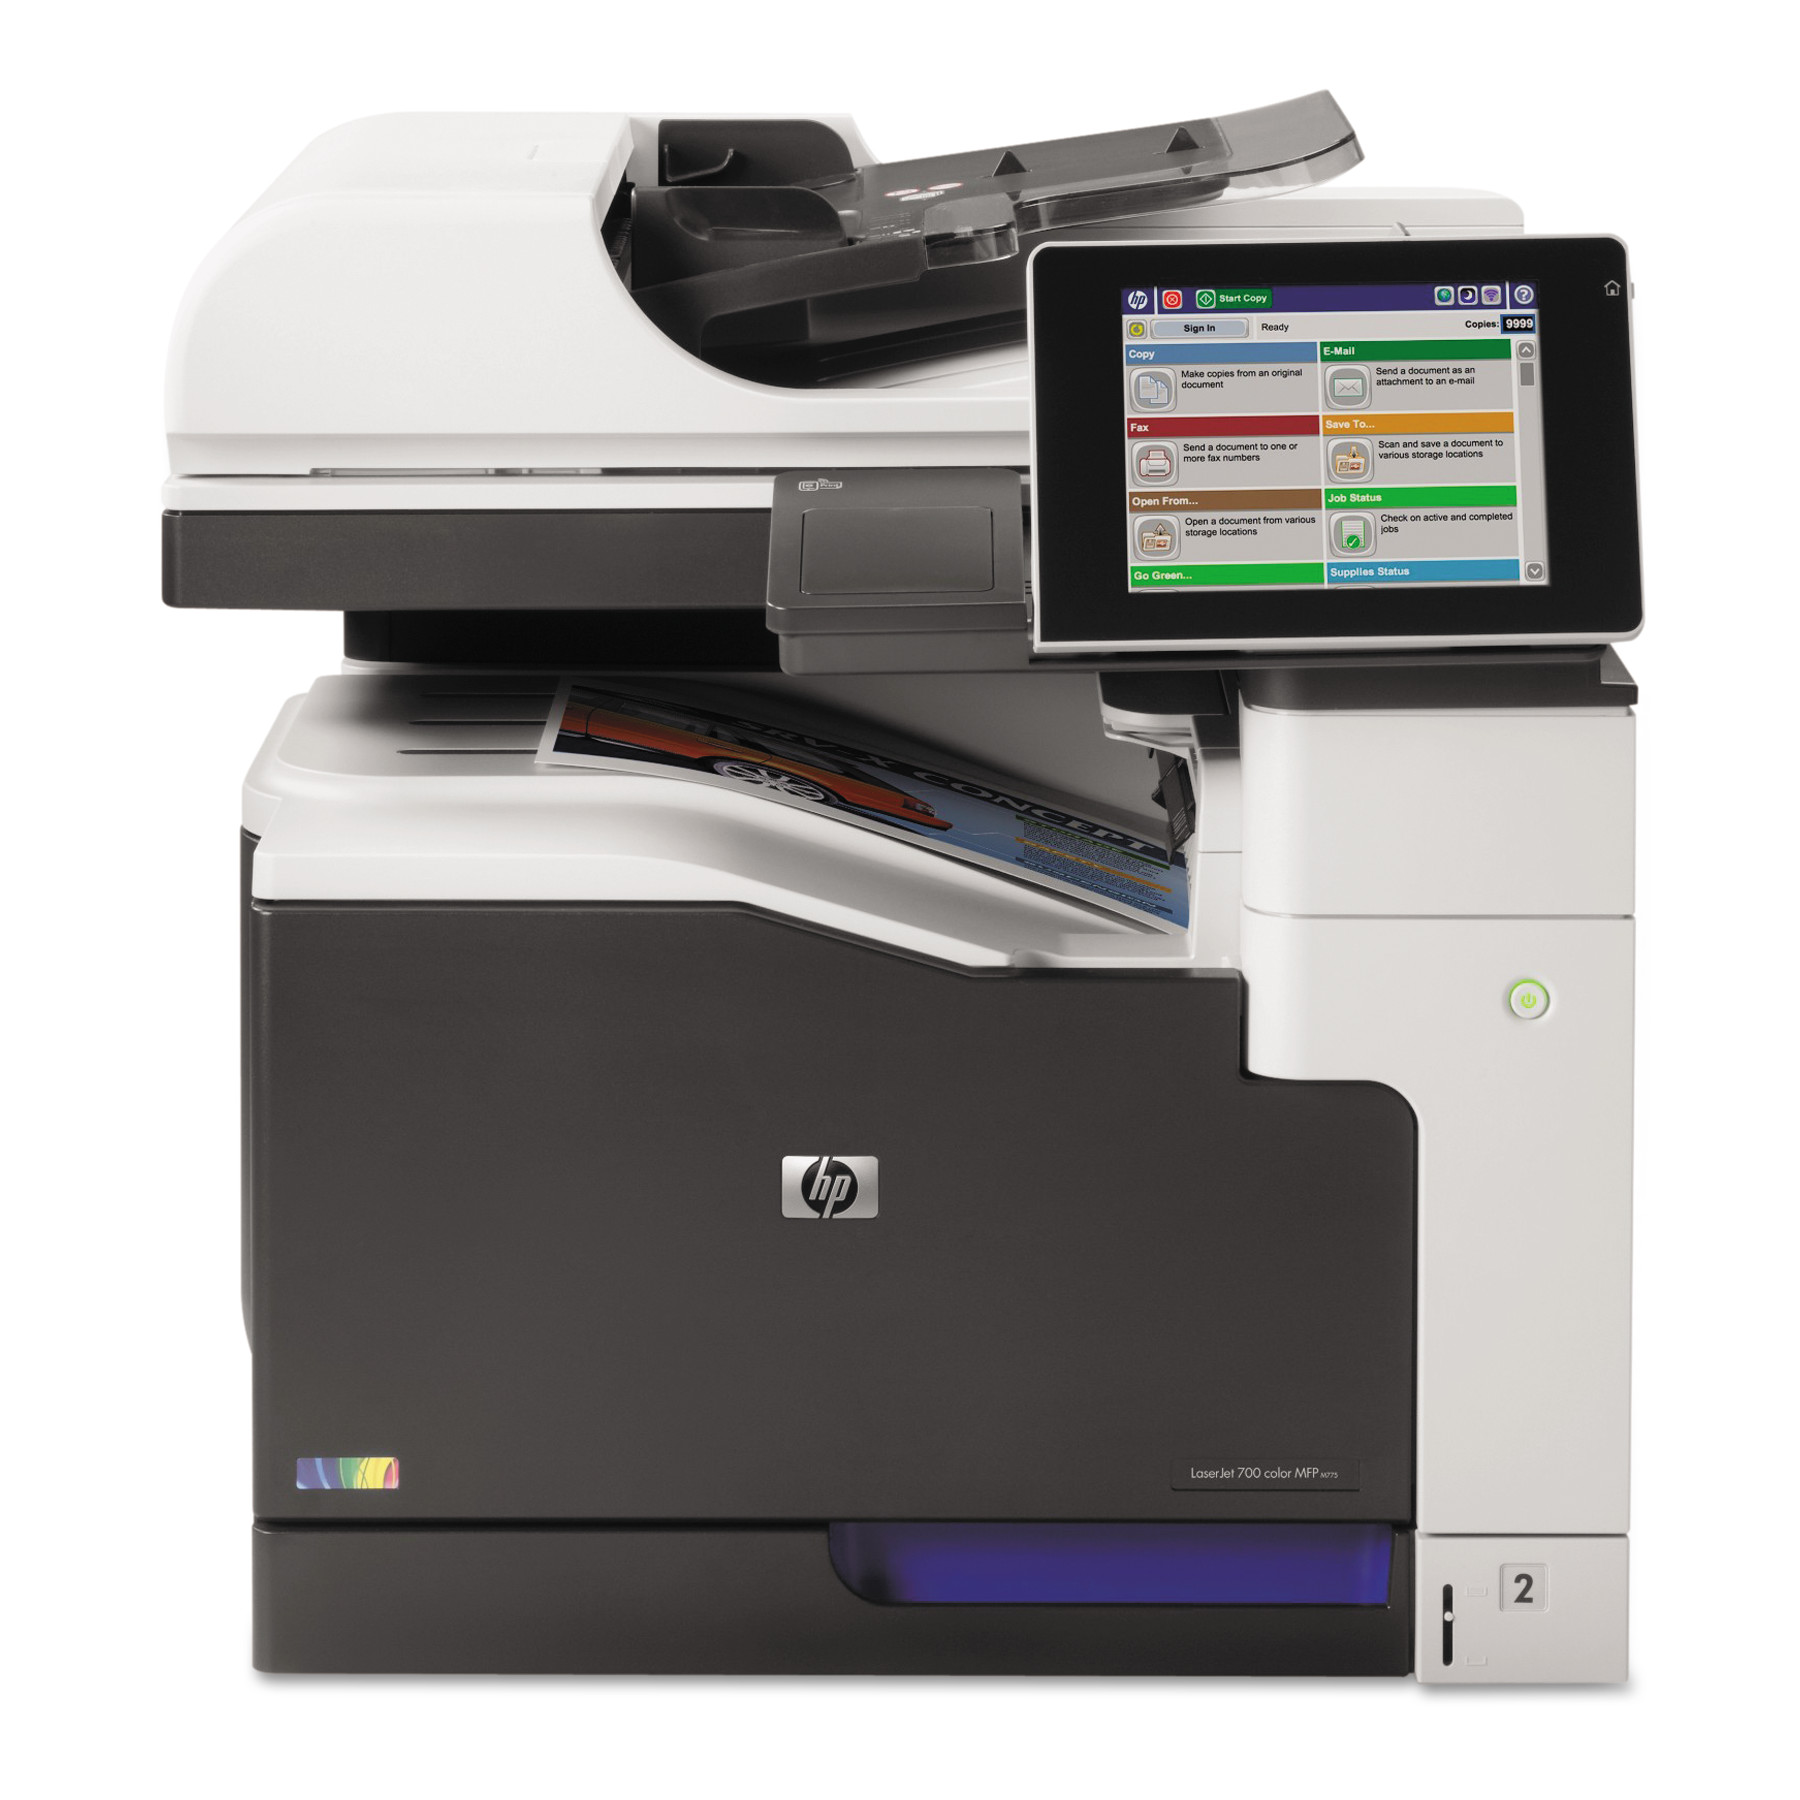 HP LaserJet Enterprise 700 Color MFP M775dn Laser Printer, Copy Print Scan by HP